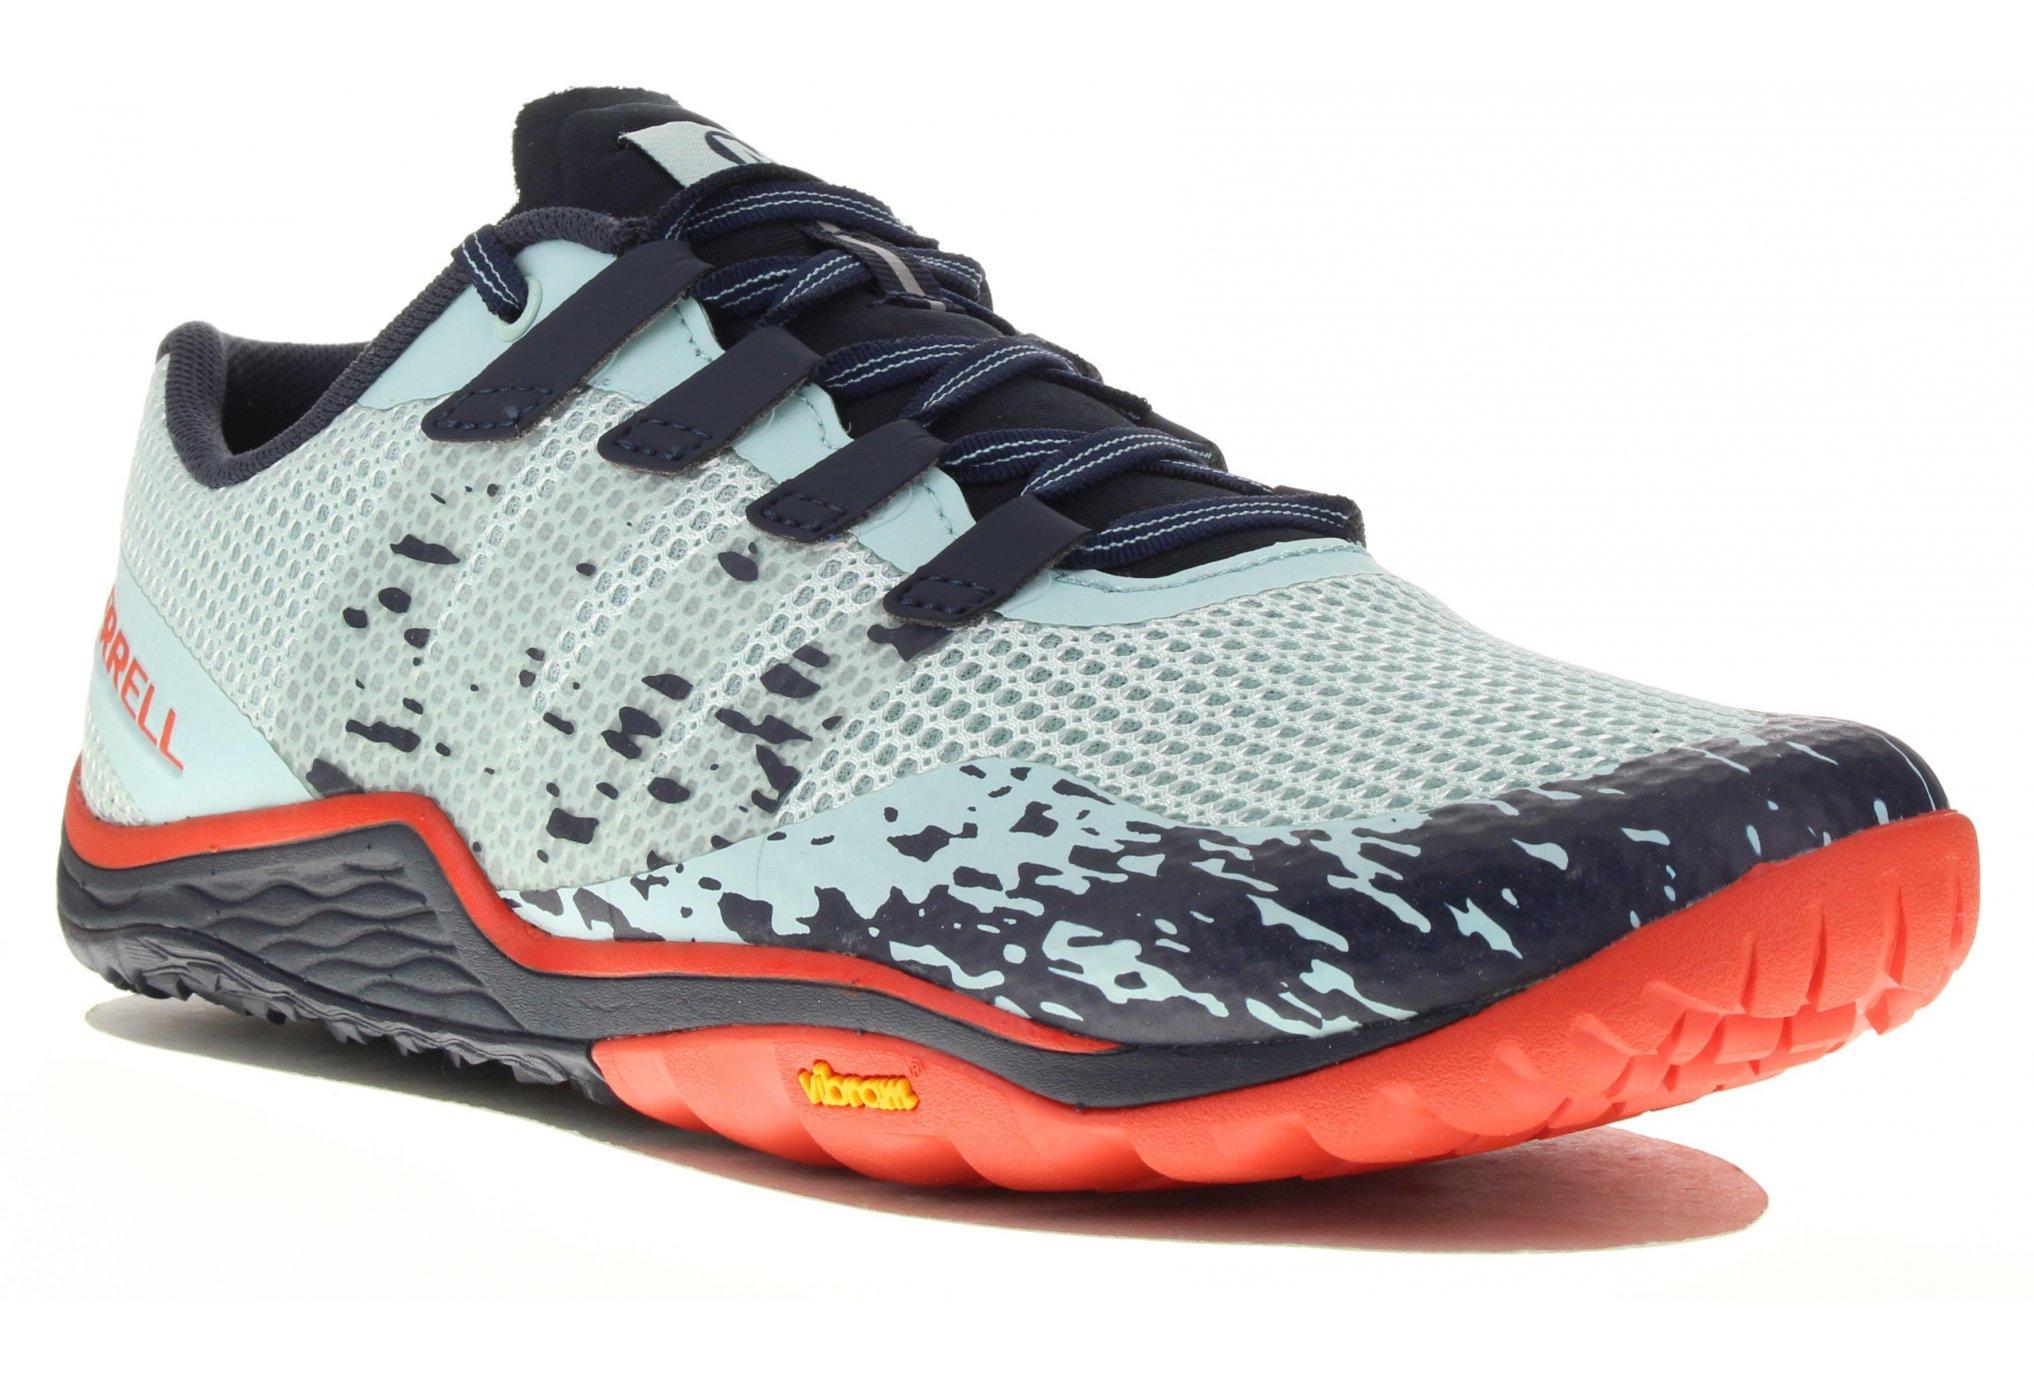 Merrell Trail Glove 5 Chaussures running femme